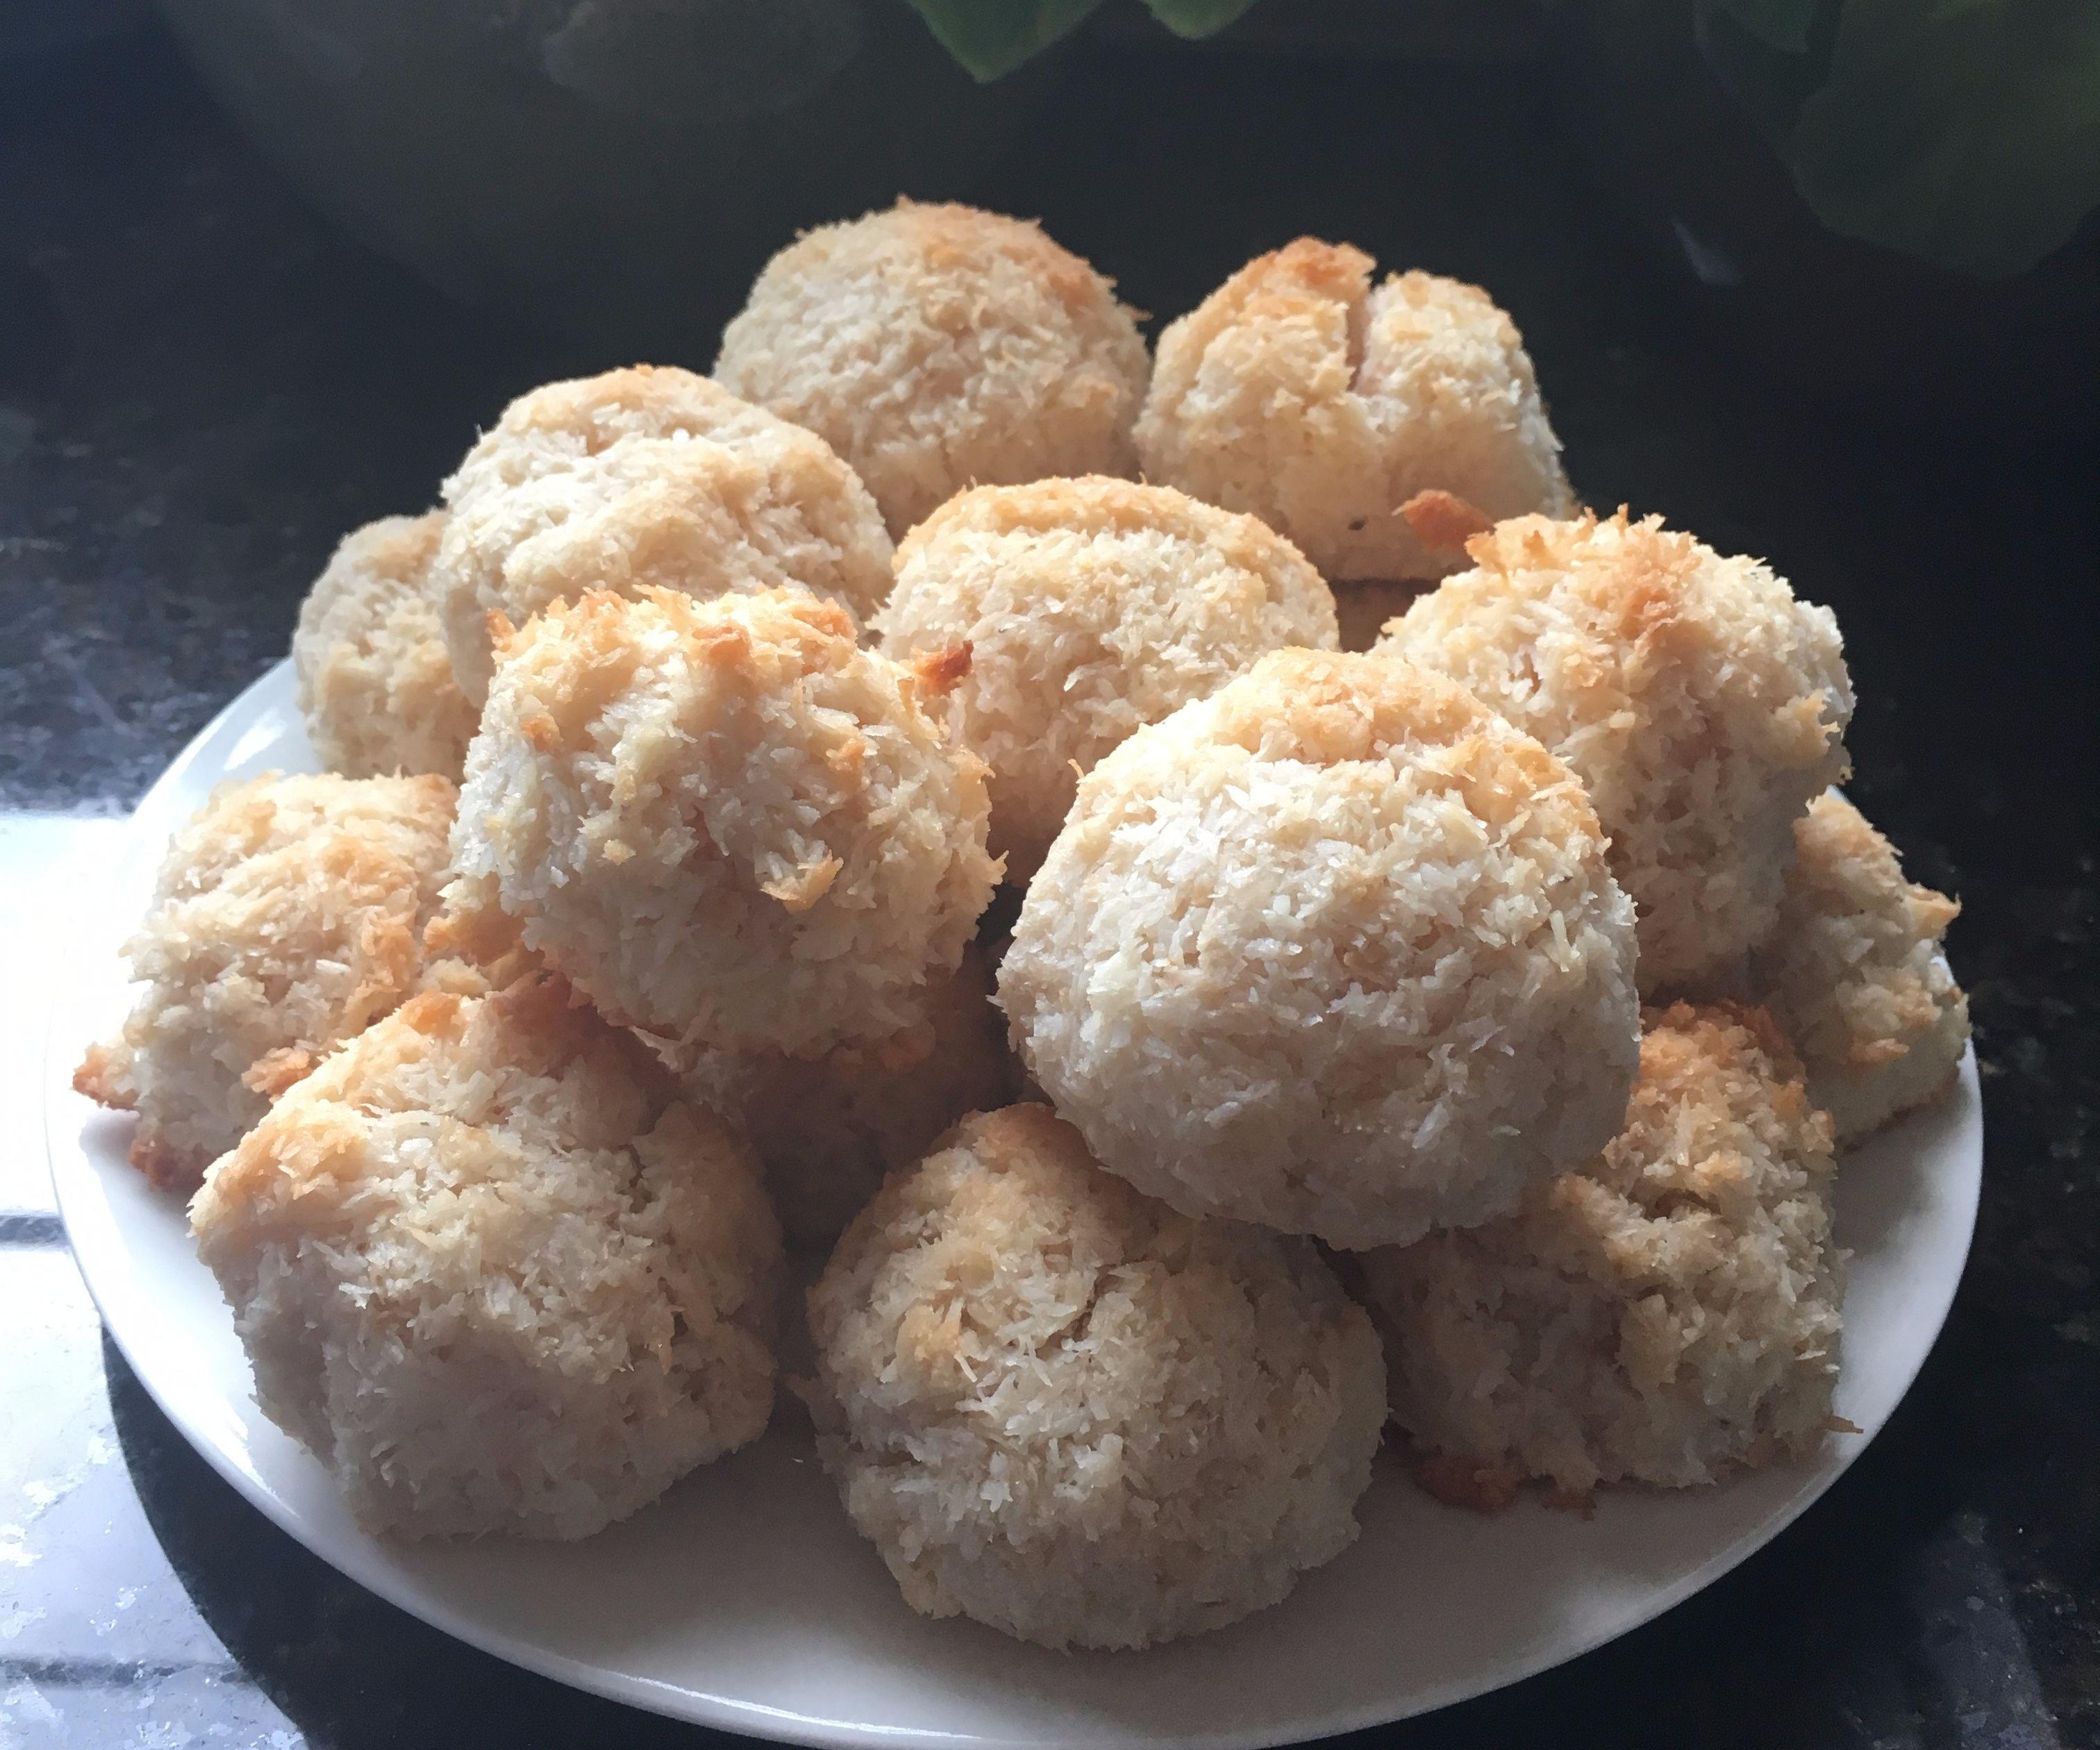 Delicious Coconut Macaroons